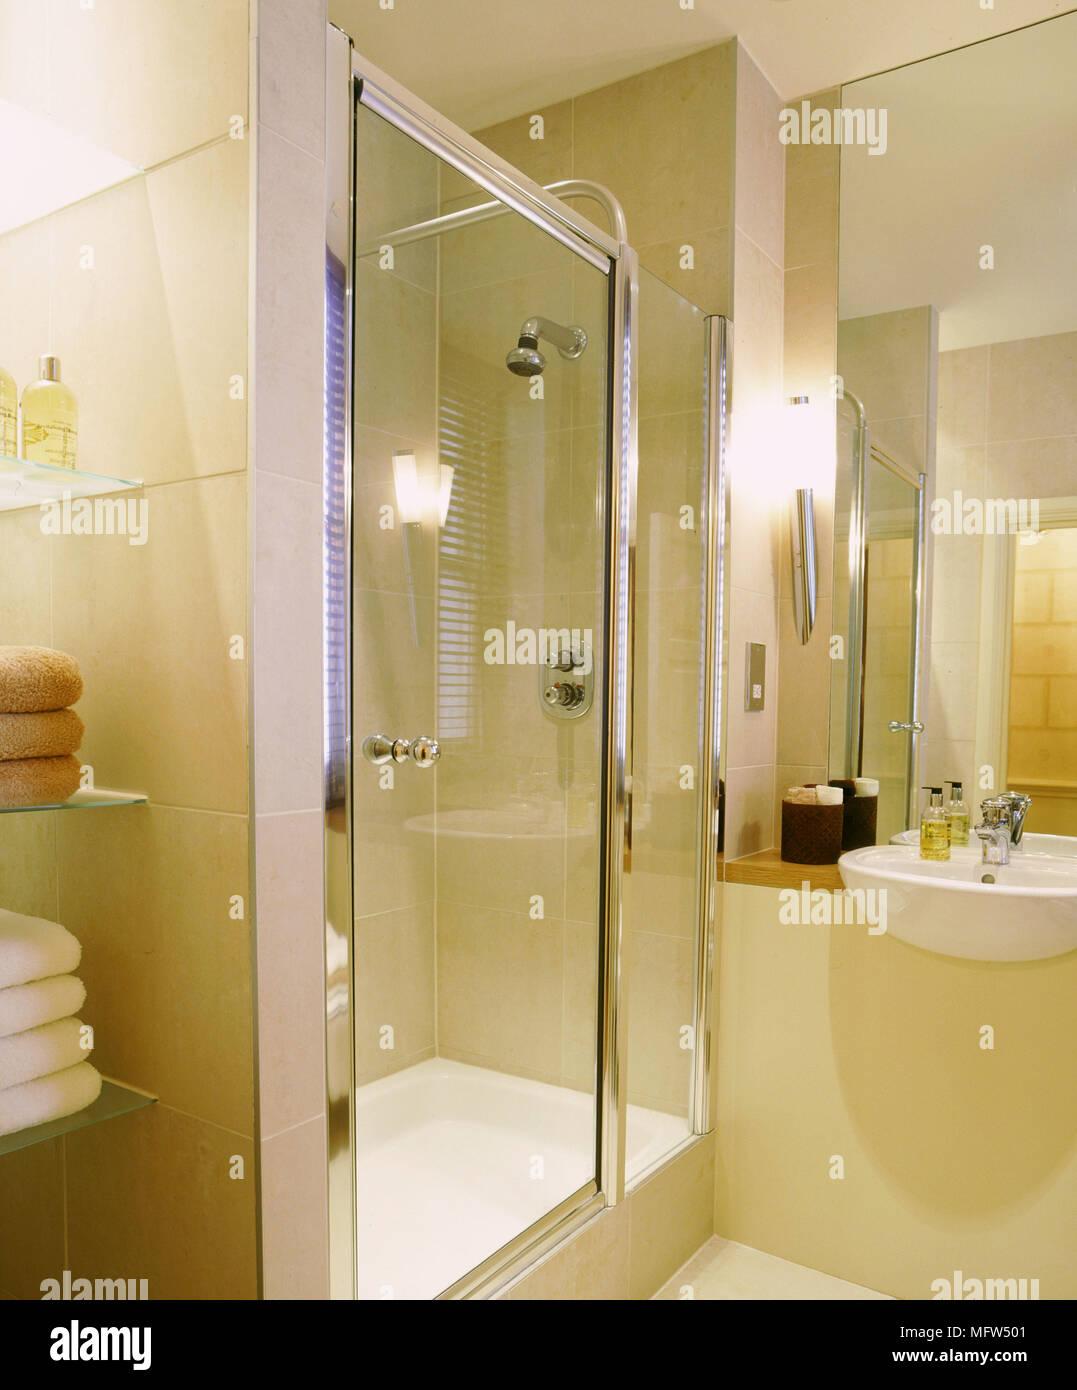 Modern neutral bathroom detail shower cubicle glass door washbasin ...